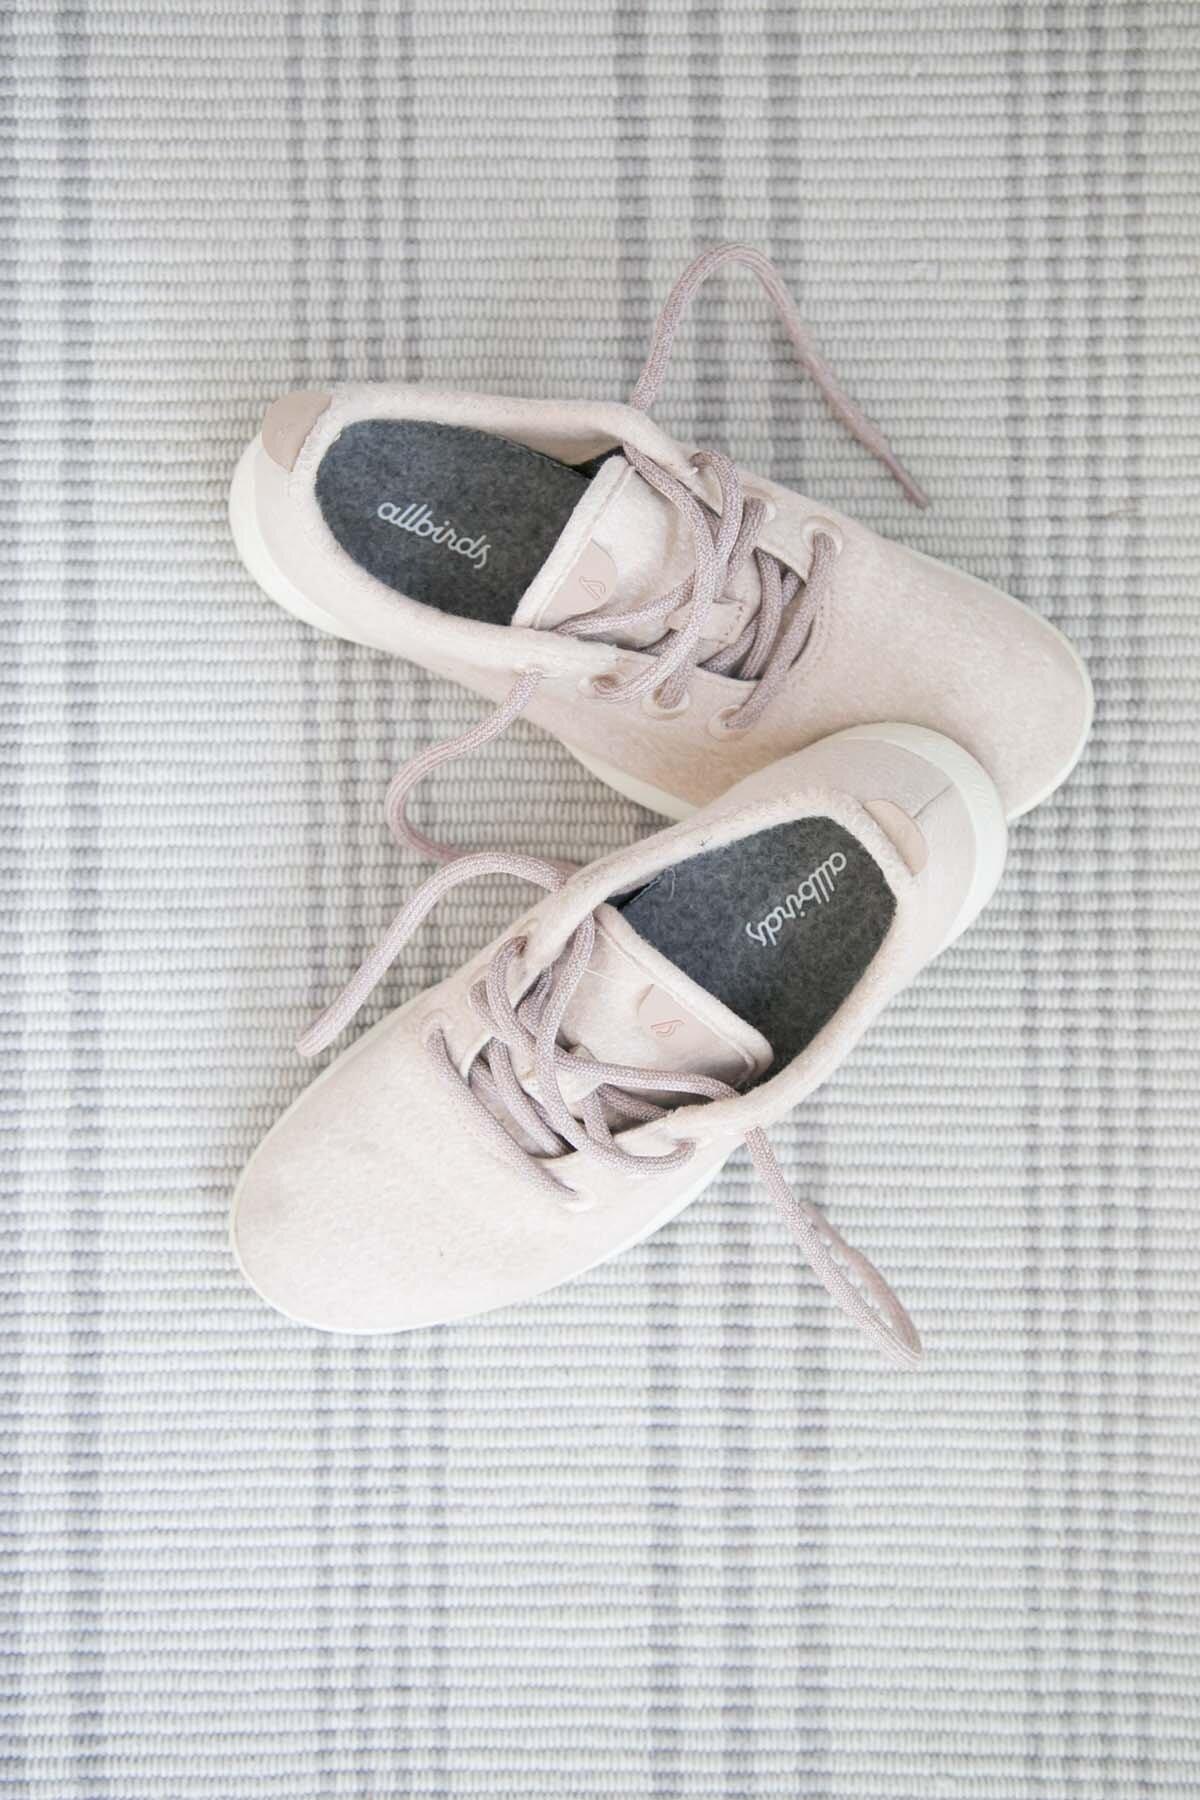 sustainable sneakers by Allbirds